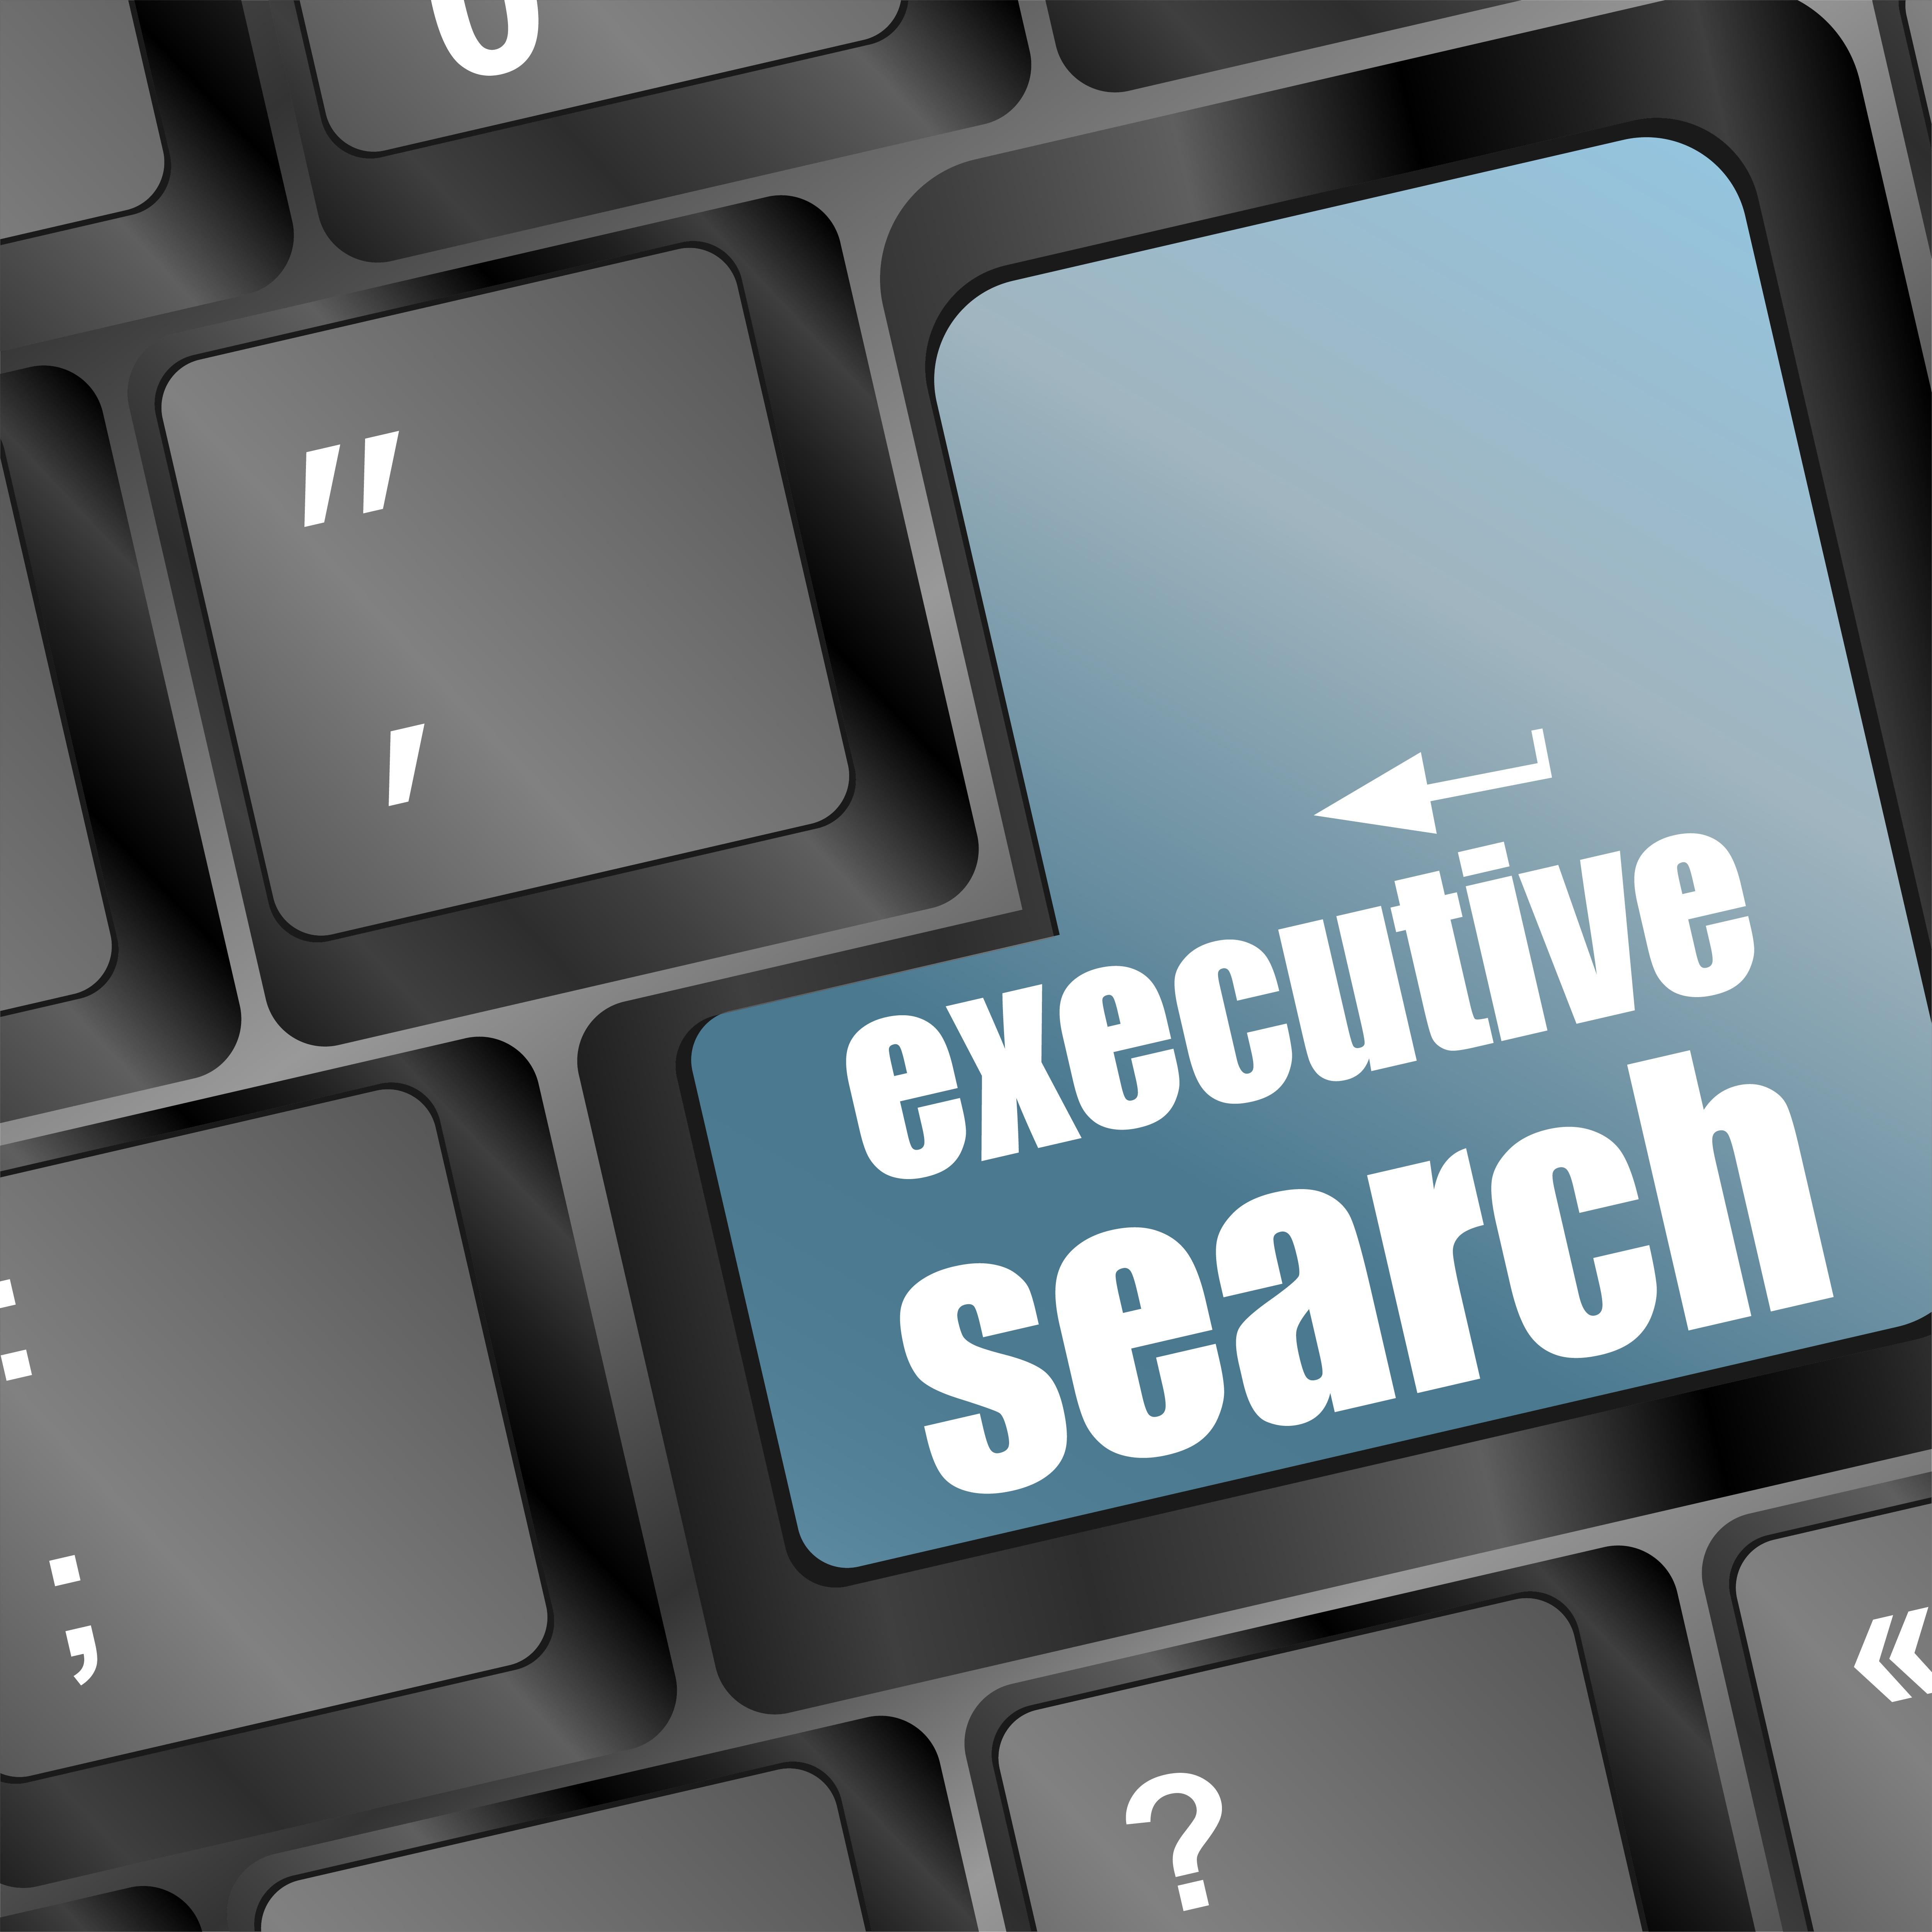 executive-search-keyboard-key